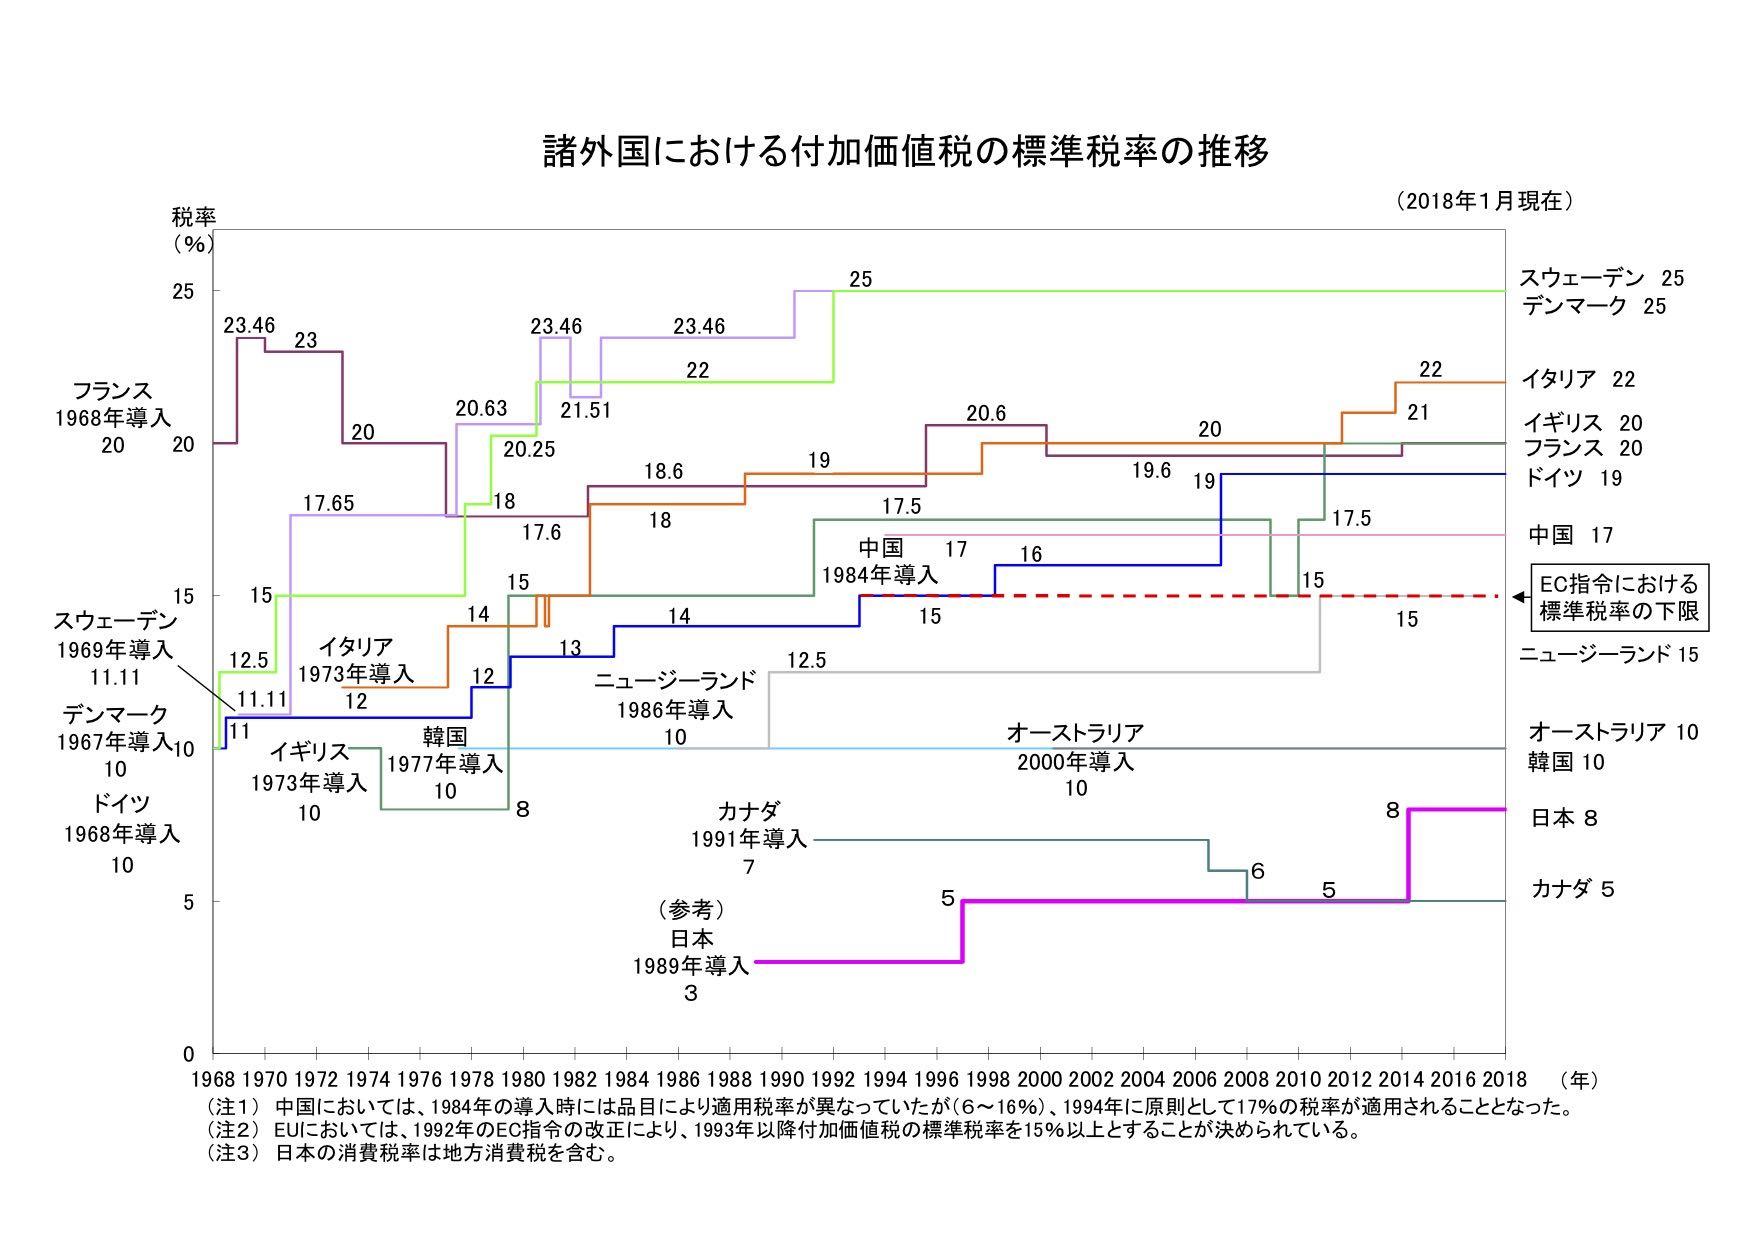 https://oshosina.c.blog.so-net.ne.jp/_images/blog/_e75/oshosina/103E381AEE382B3E38392E3829AE383BC2.jpg